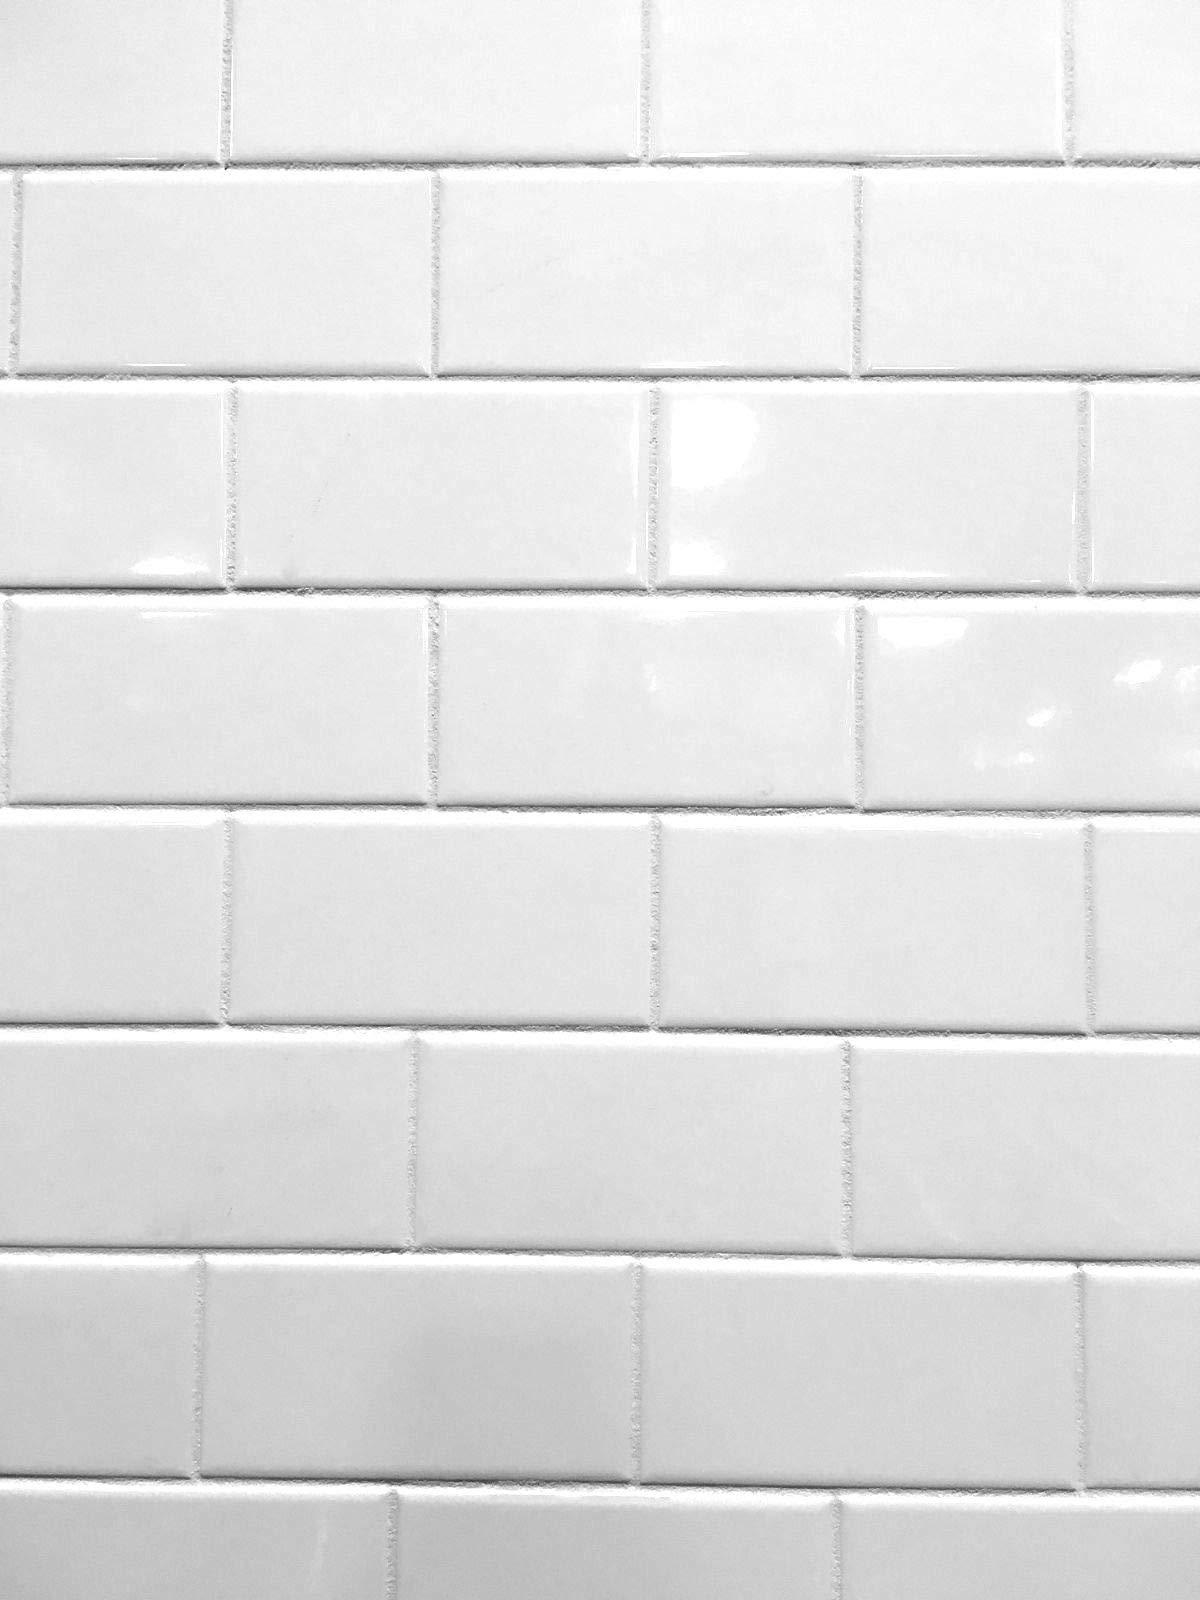 3x6 White Glossy Ceramic Subway Tile Wall Backsplash Made in USA (Full Box 100) by Squarefeet Depot